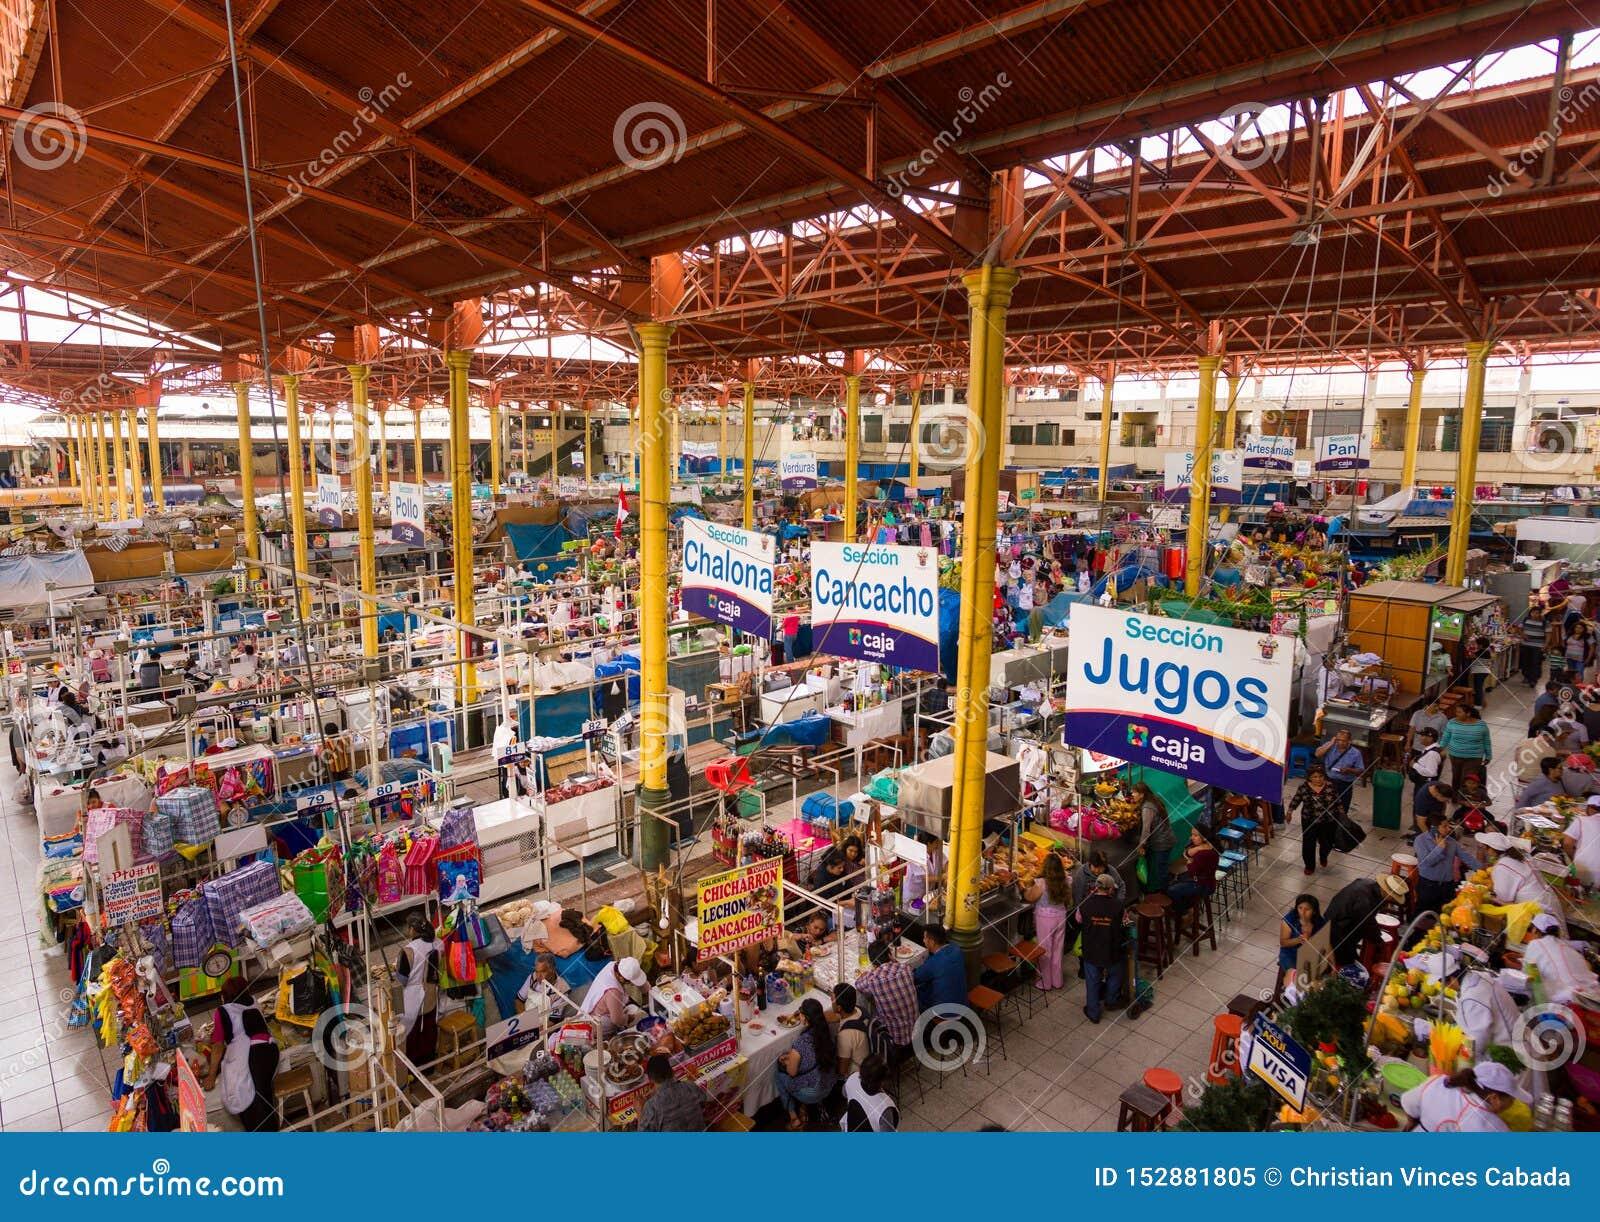 SAN CAMILO TRADITIONEEL OUD MARKET PLACE IN AREQUIPA, PERU